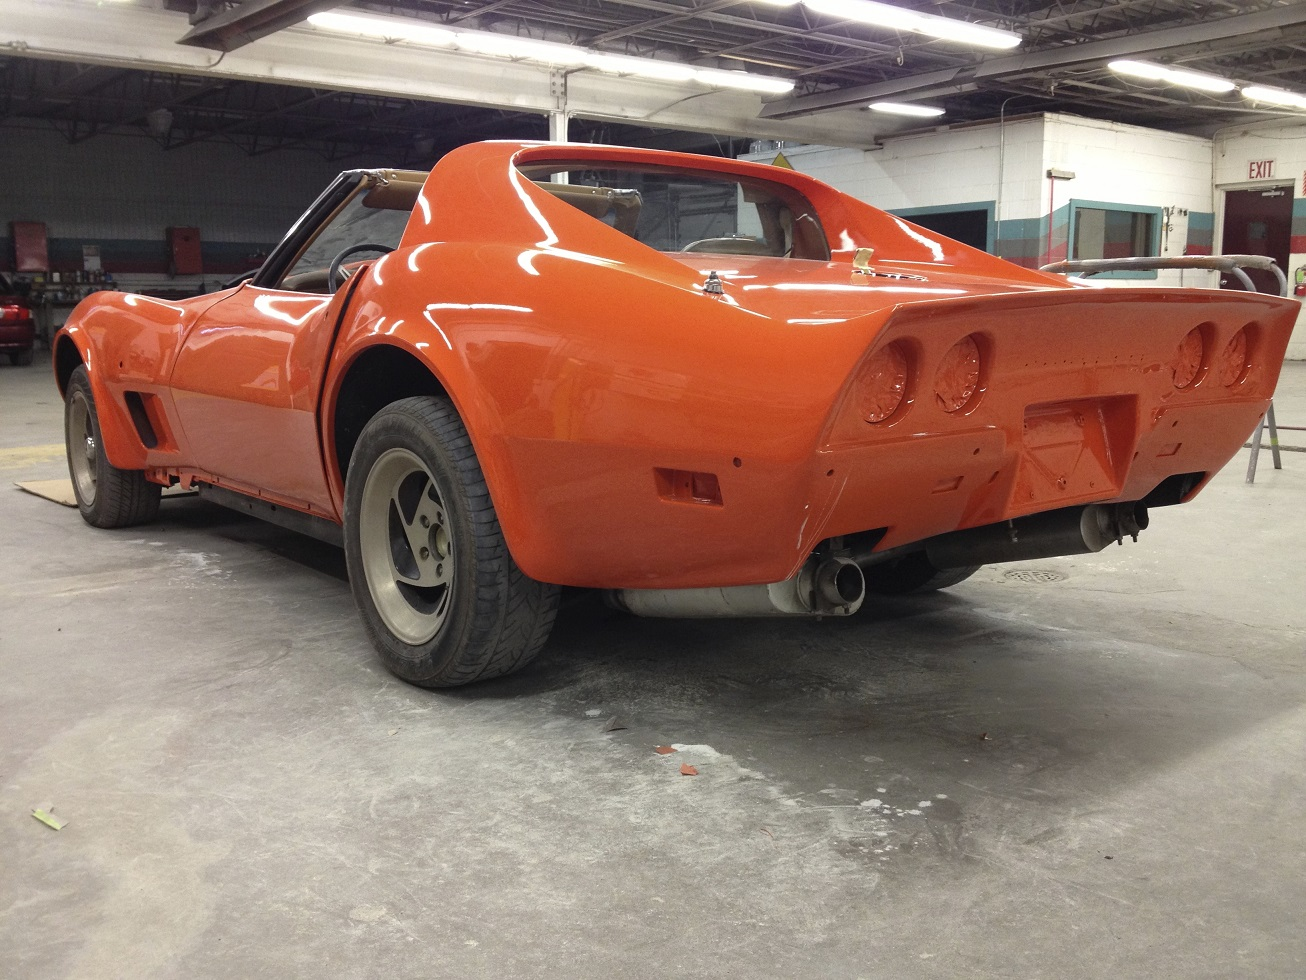 ... 1988 Corvette furthermore 1966 Corvette 427 425. on corvette c6 engine